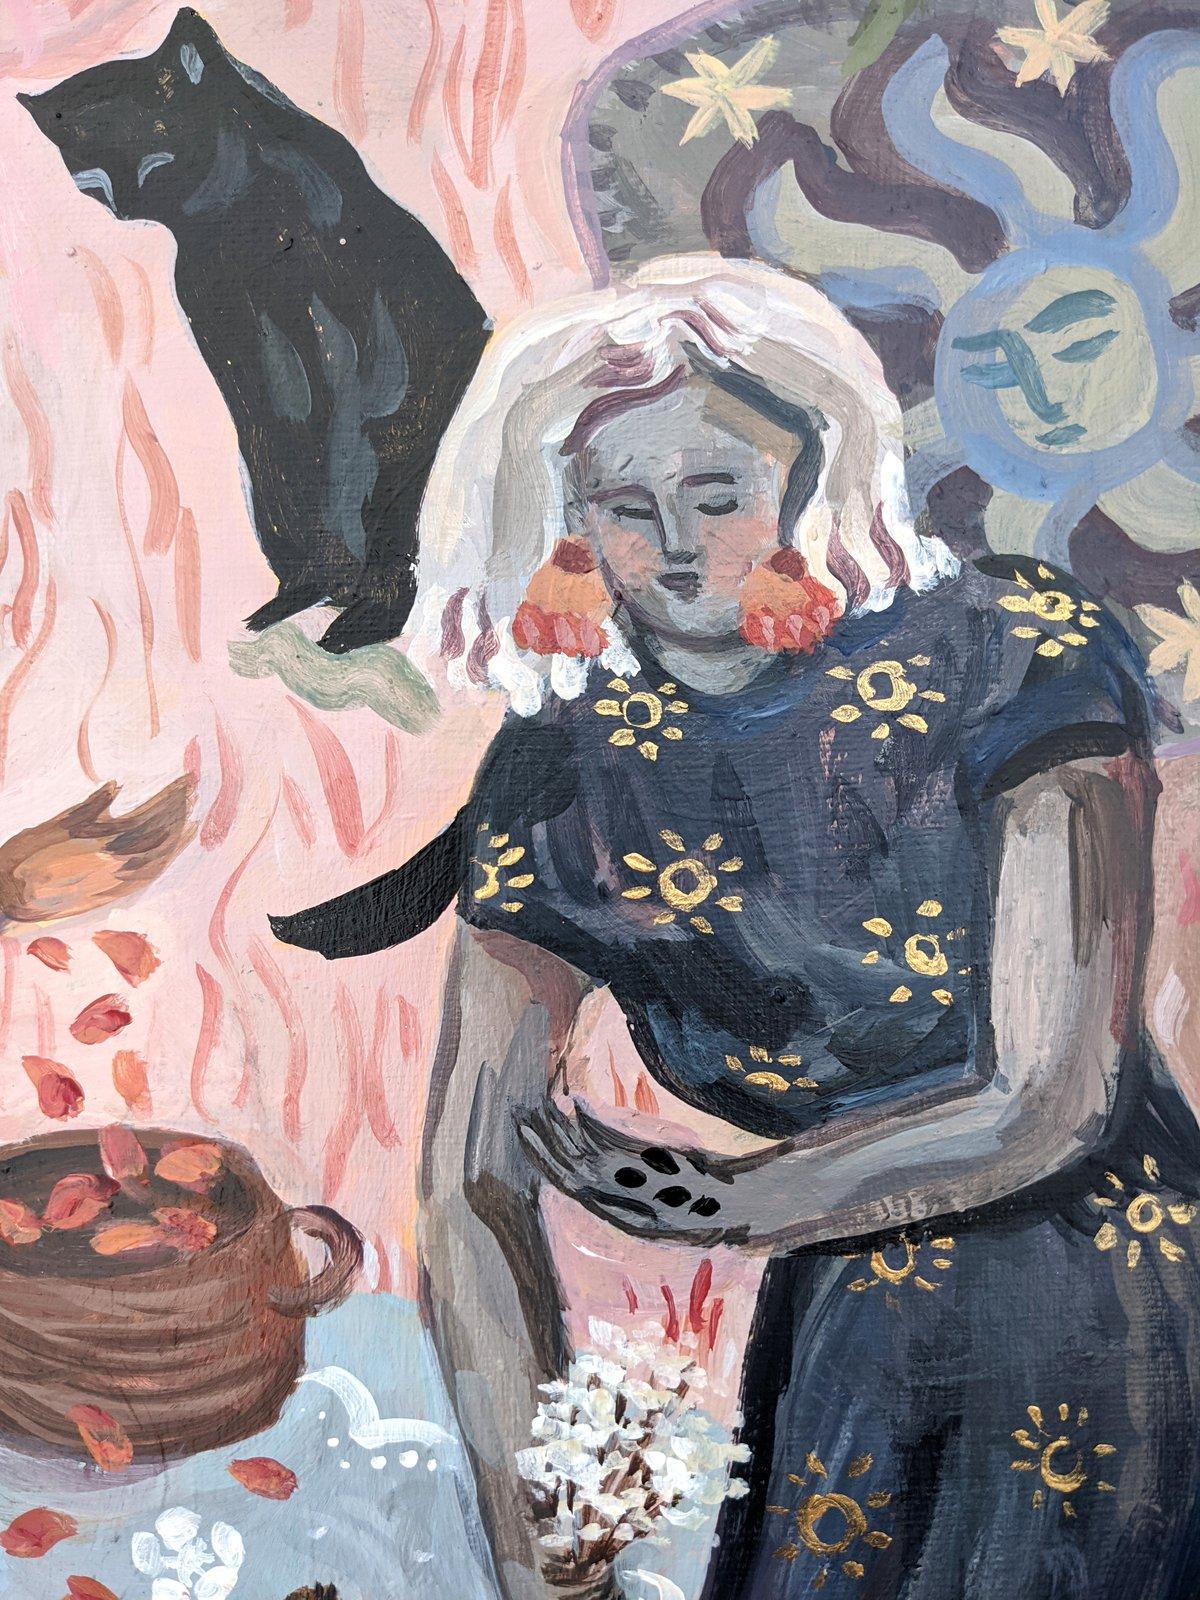 Image of Floor Magic | 16x20 Original acrylic painting on canvas